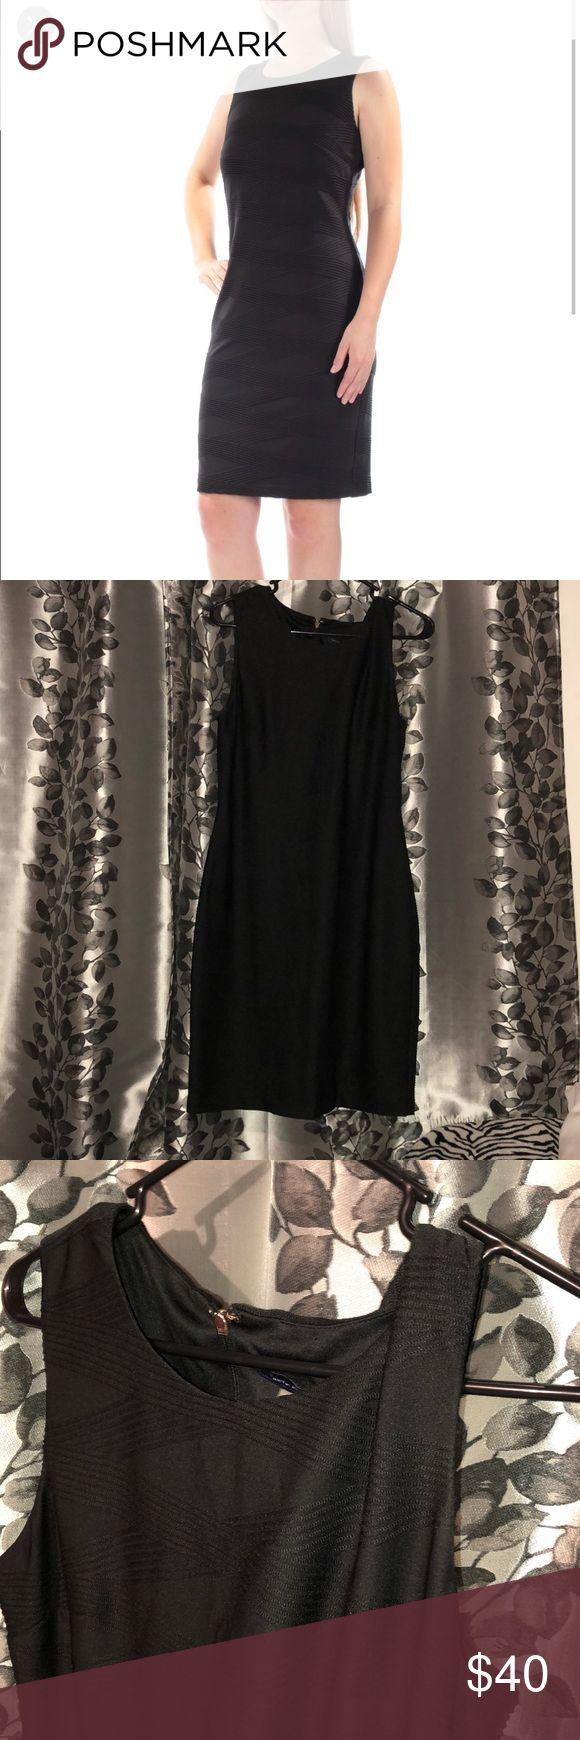 Tommy Hilfiger black dress Tommy Hilfiger textured black dress. size 10 New without original tags Tommy Hilfiger Dresses